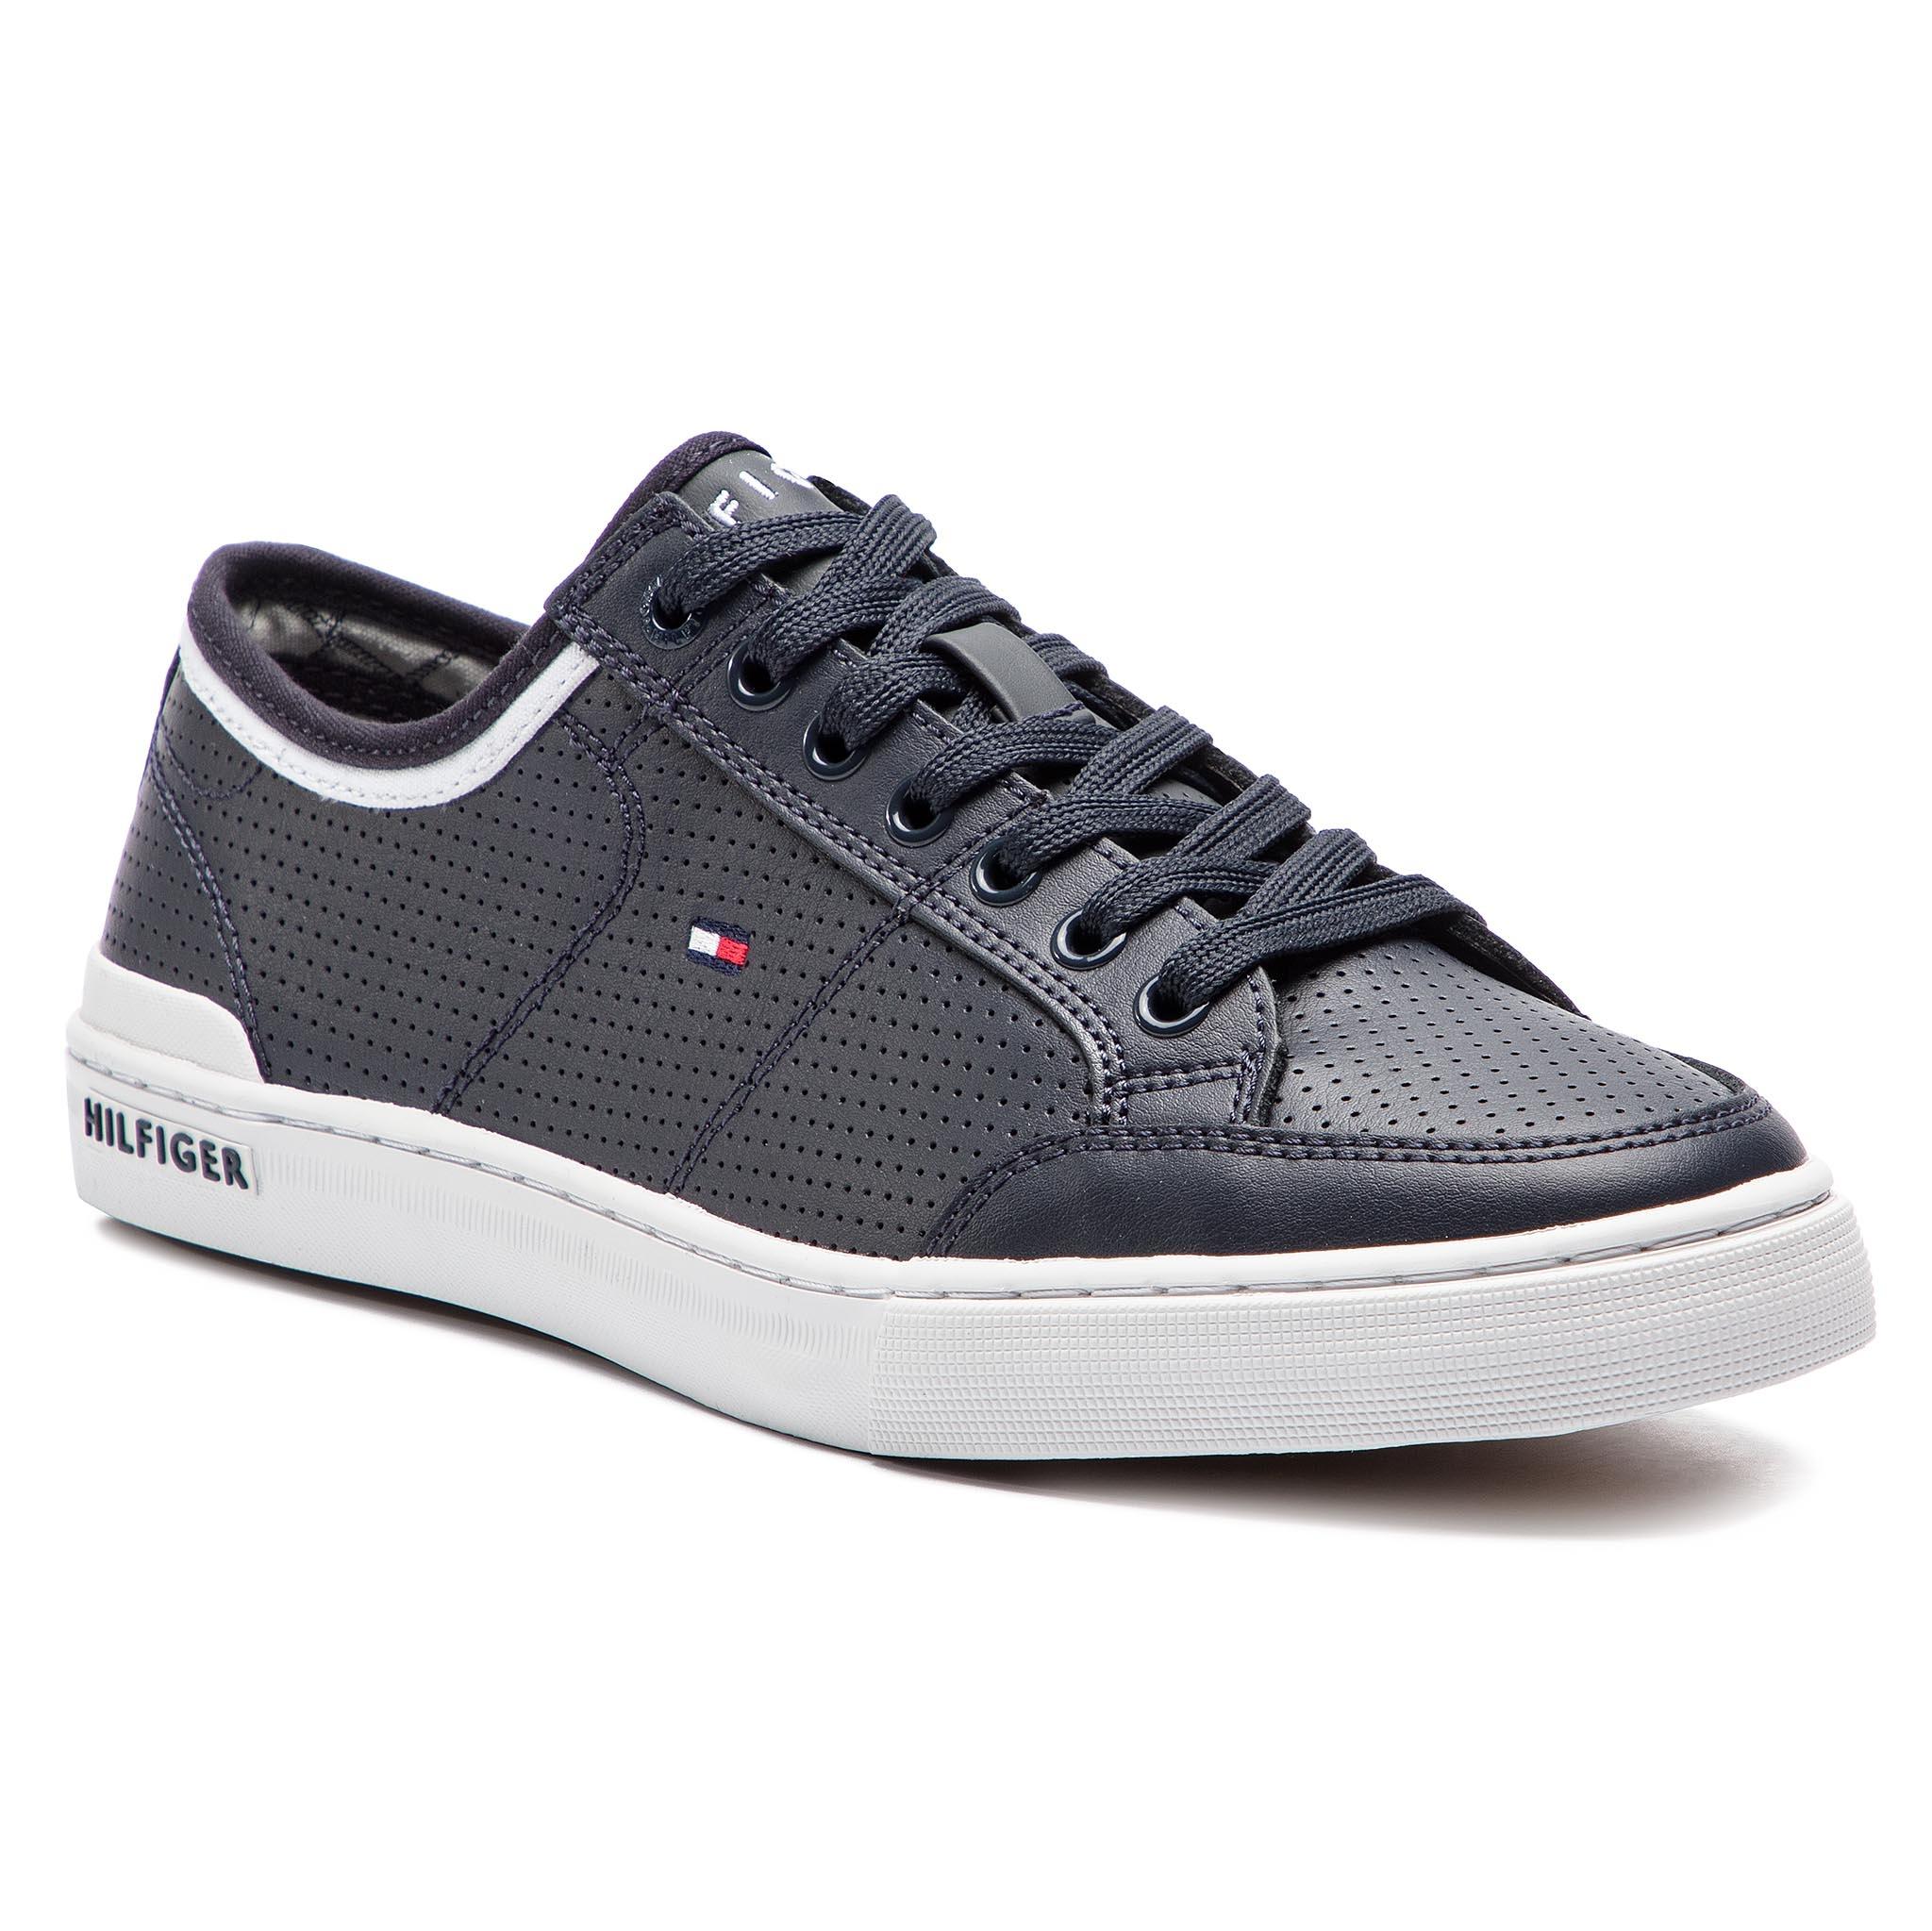 Nové Polobotky TOMMY HILFIGER - Core Corporate Leather Sneaker FM0FM00552  Midnight 403 fe95fef9fa8